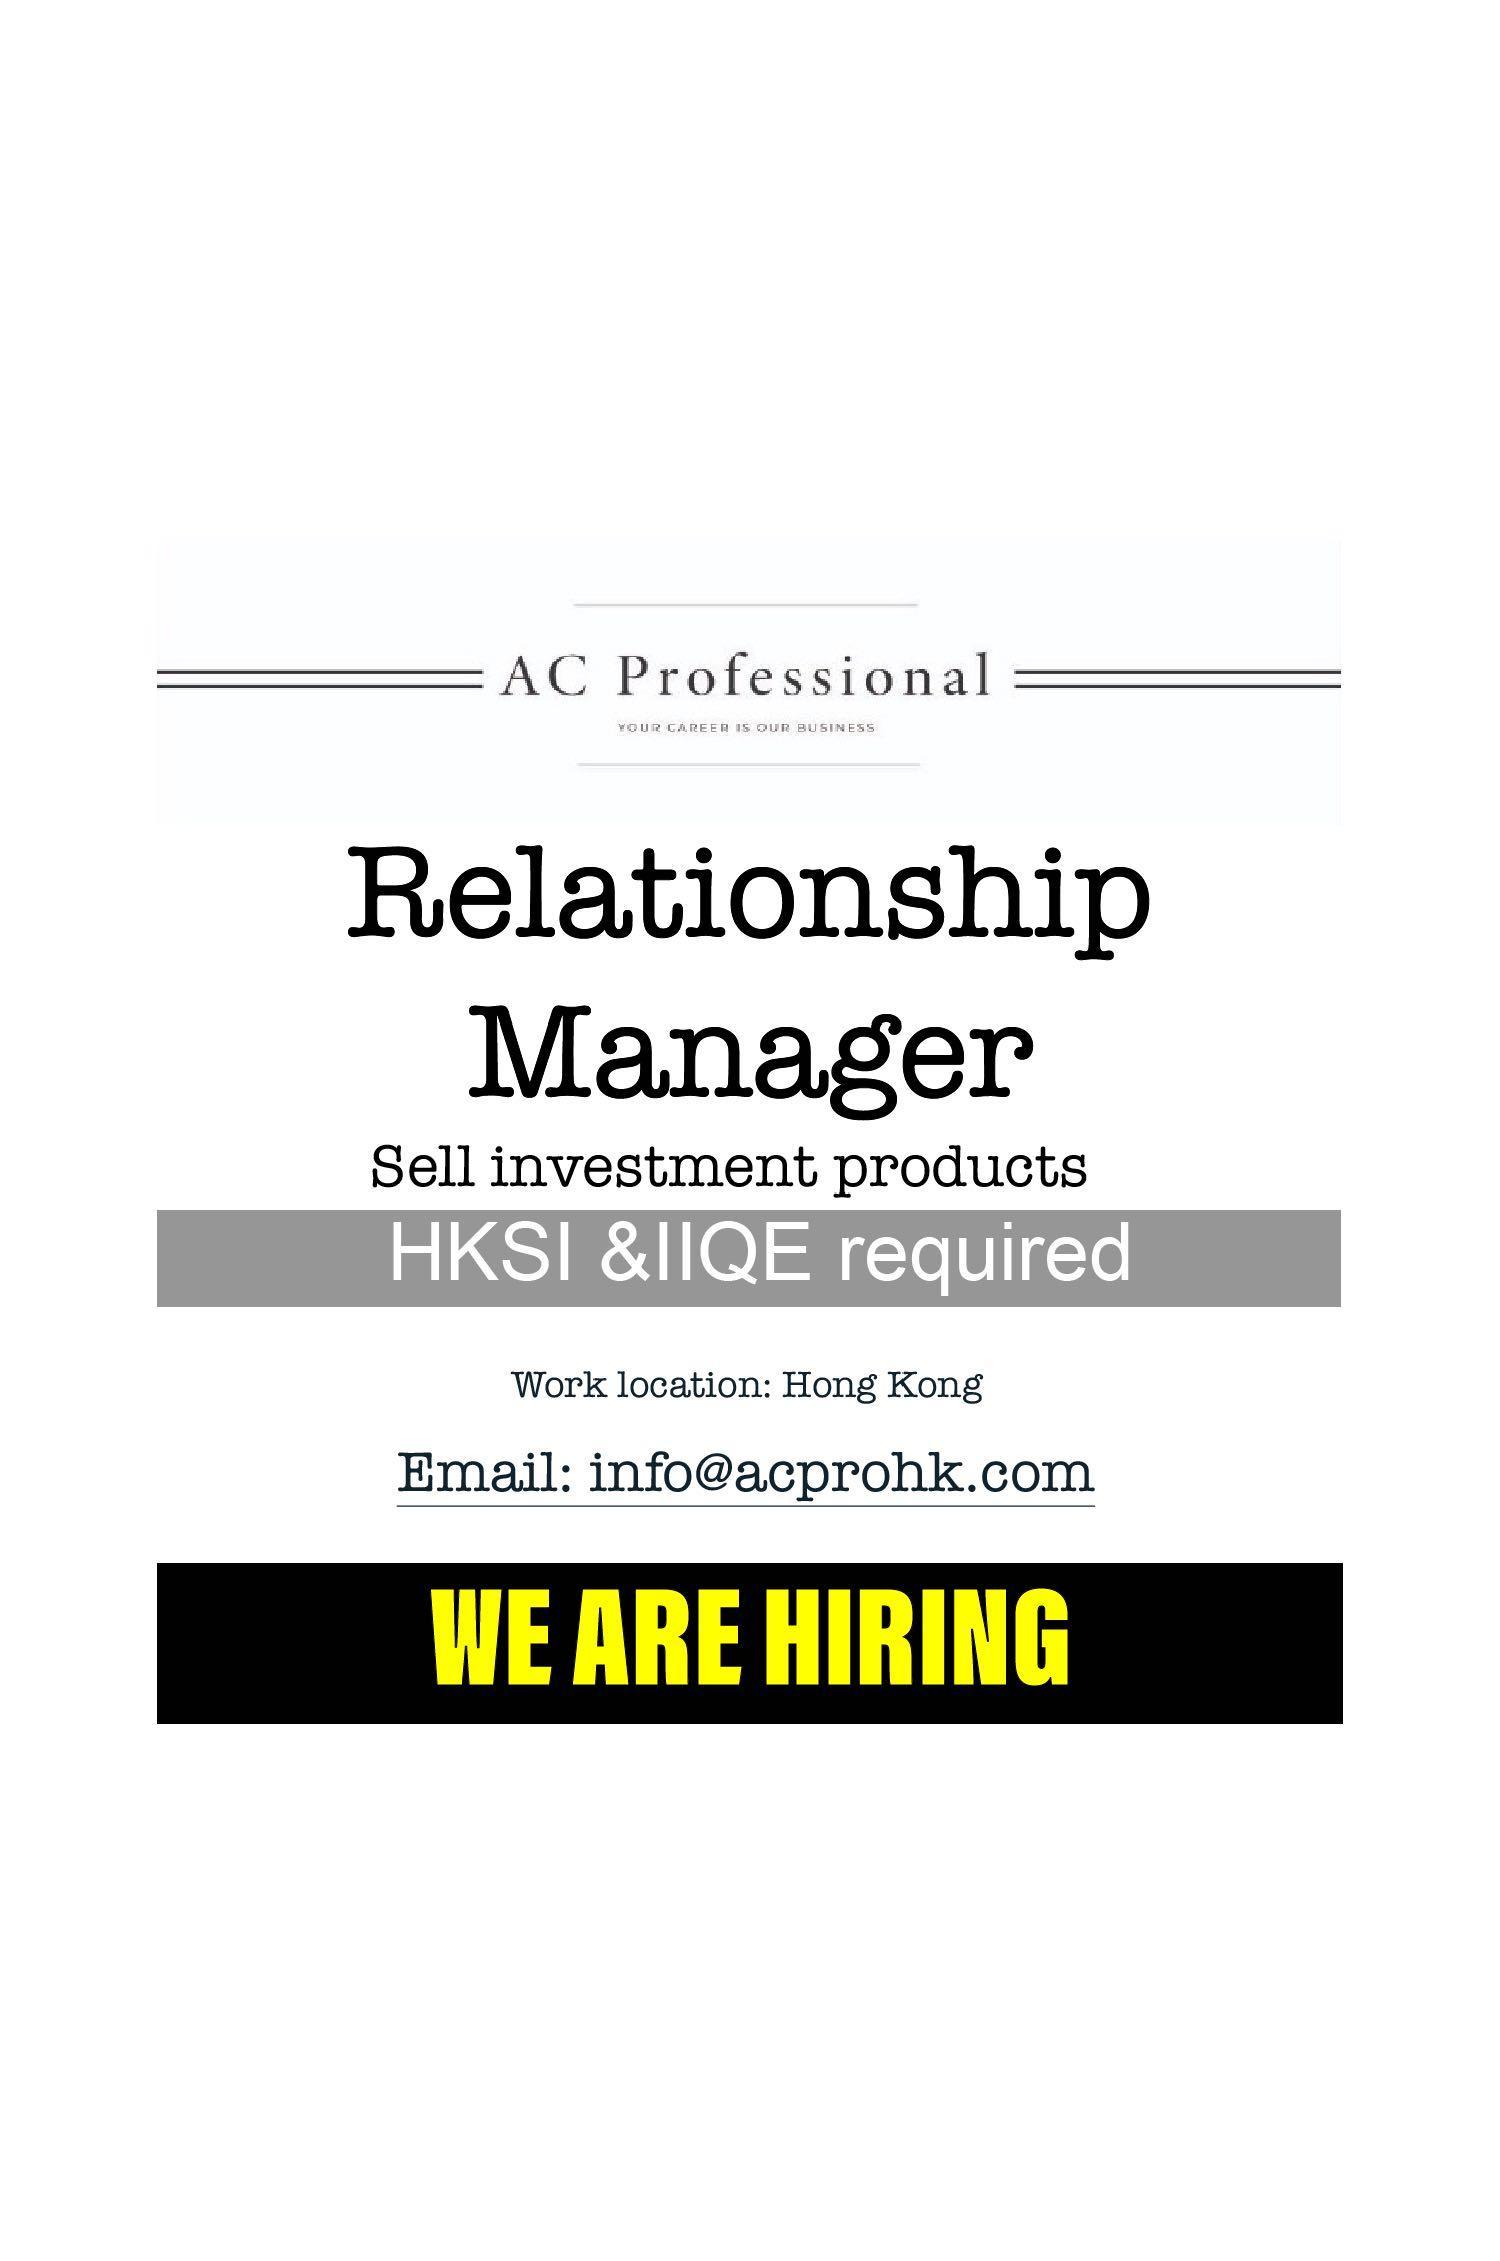 Relationship Manager